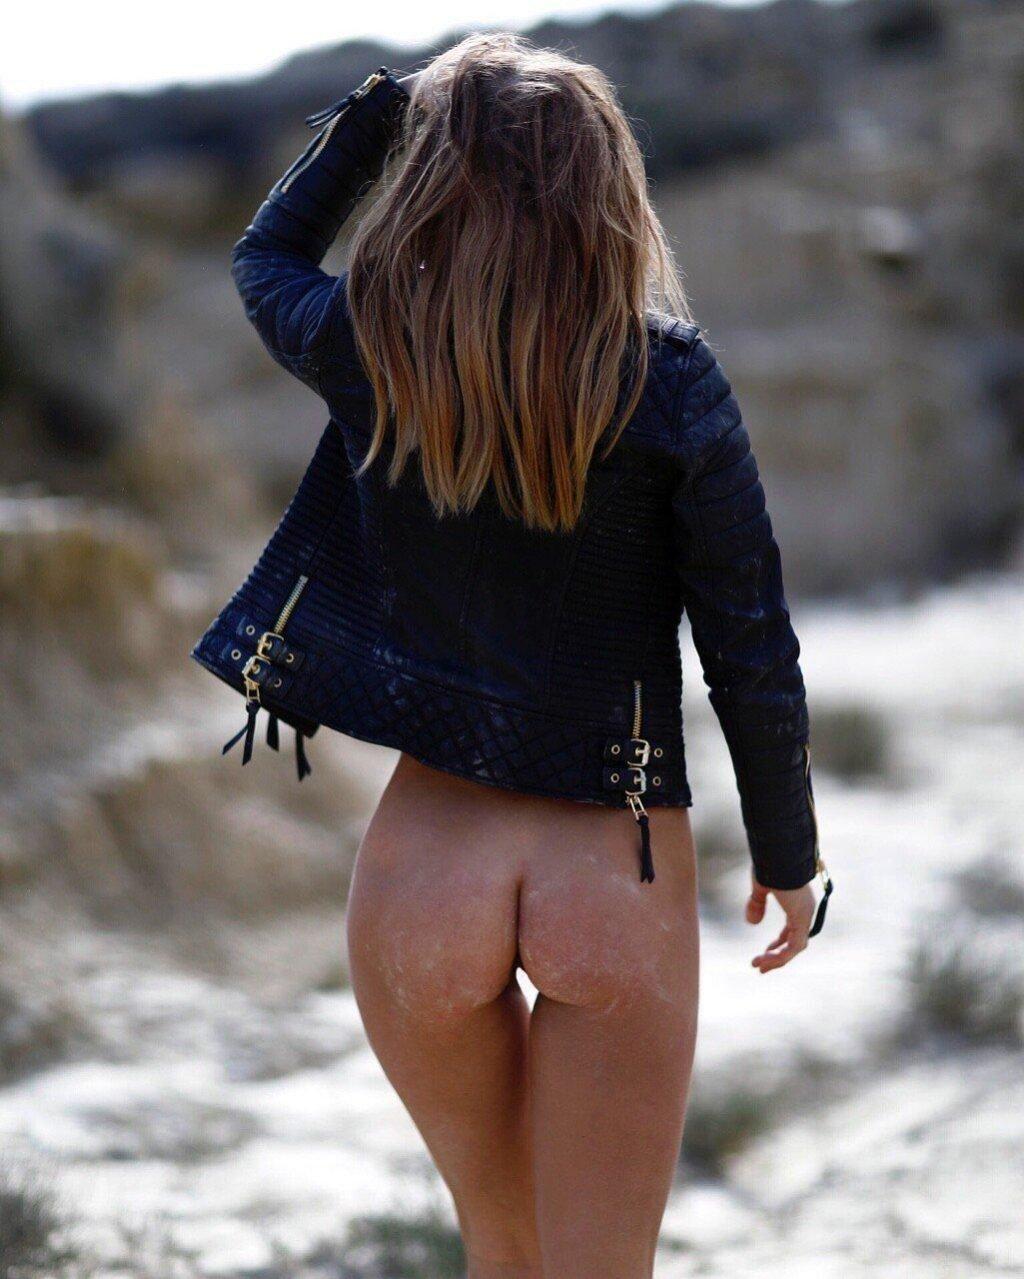 Marisa Papen Nude (28 Photos + Video)